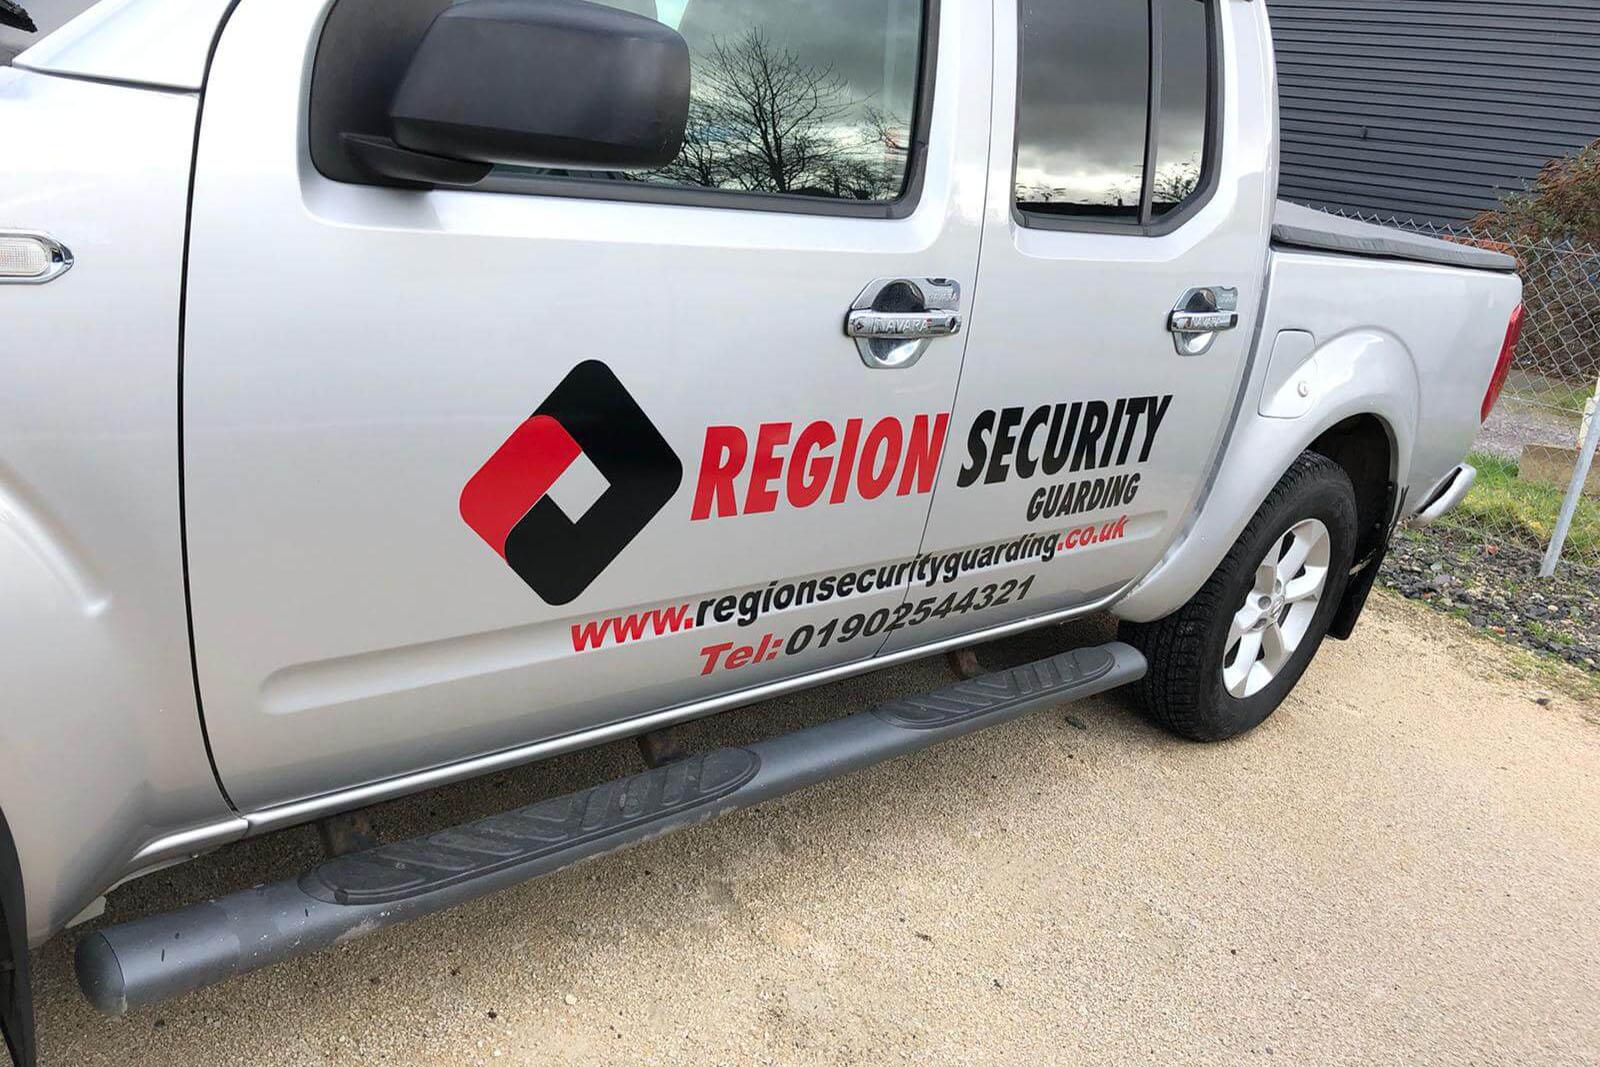 security-firms-castle-donington